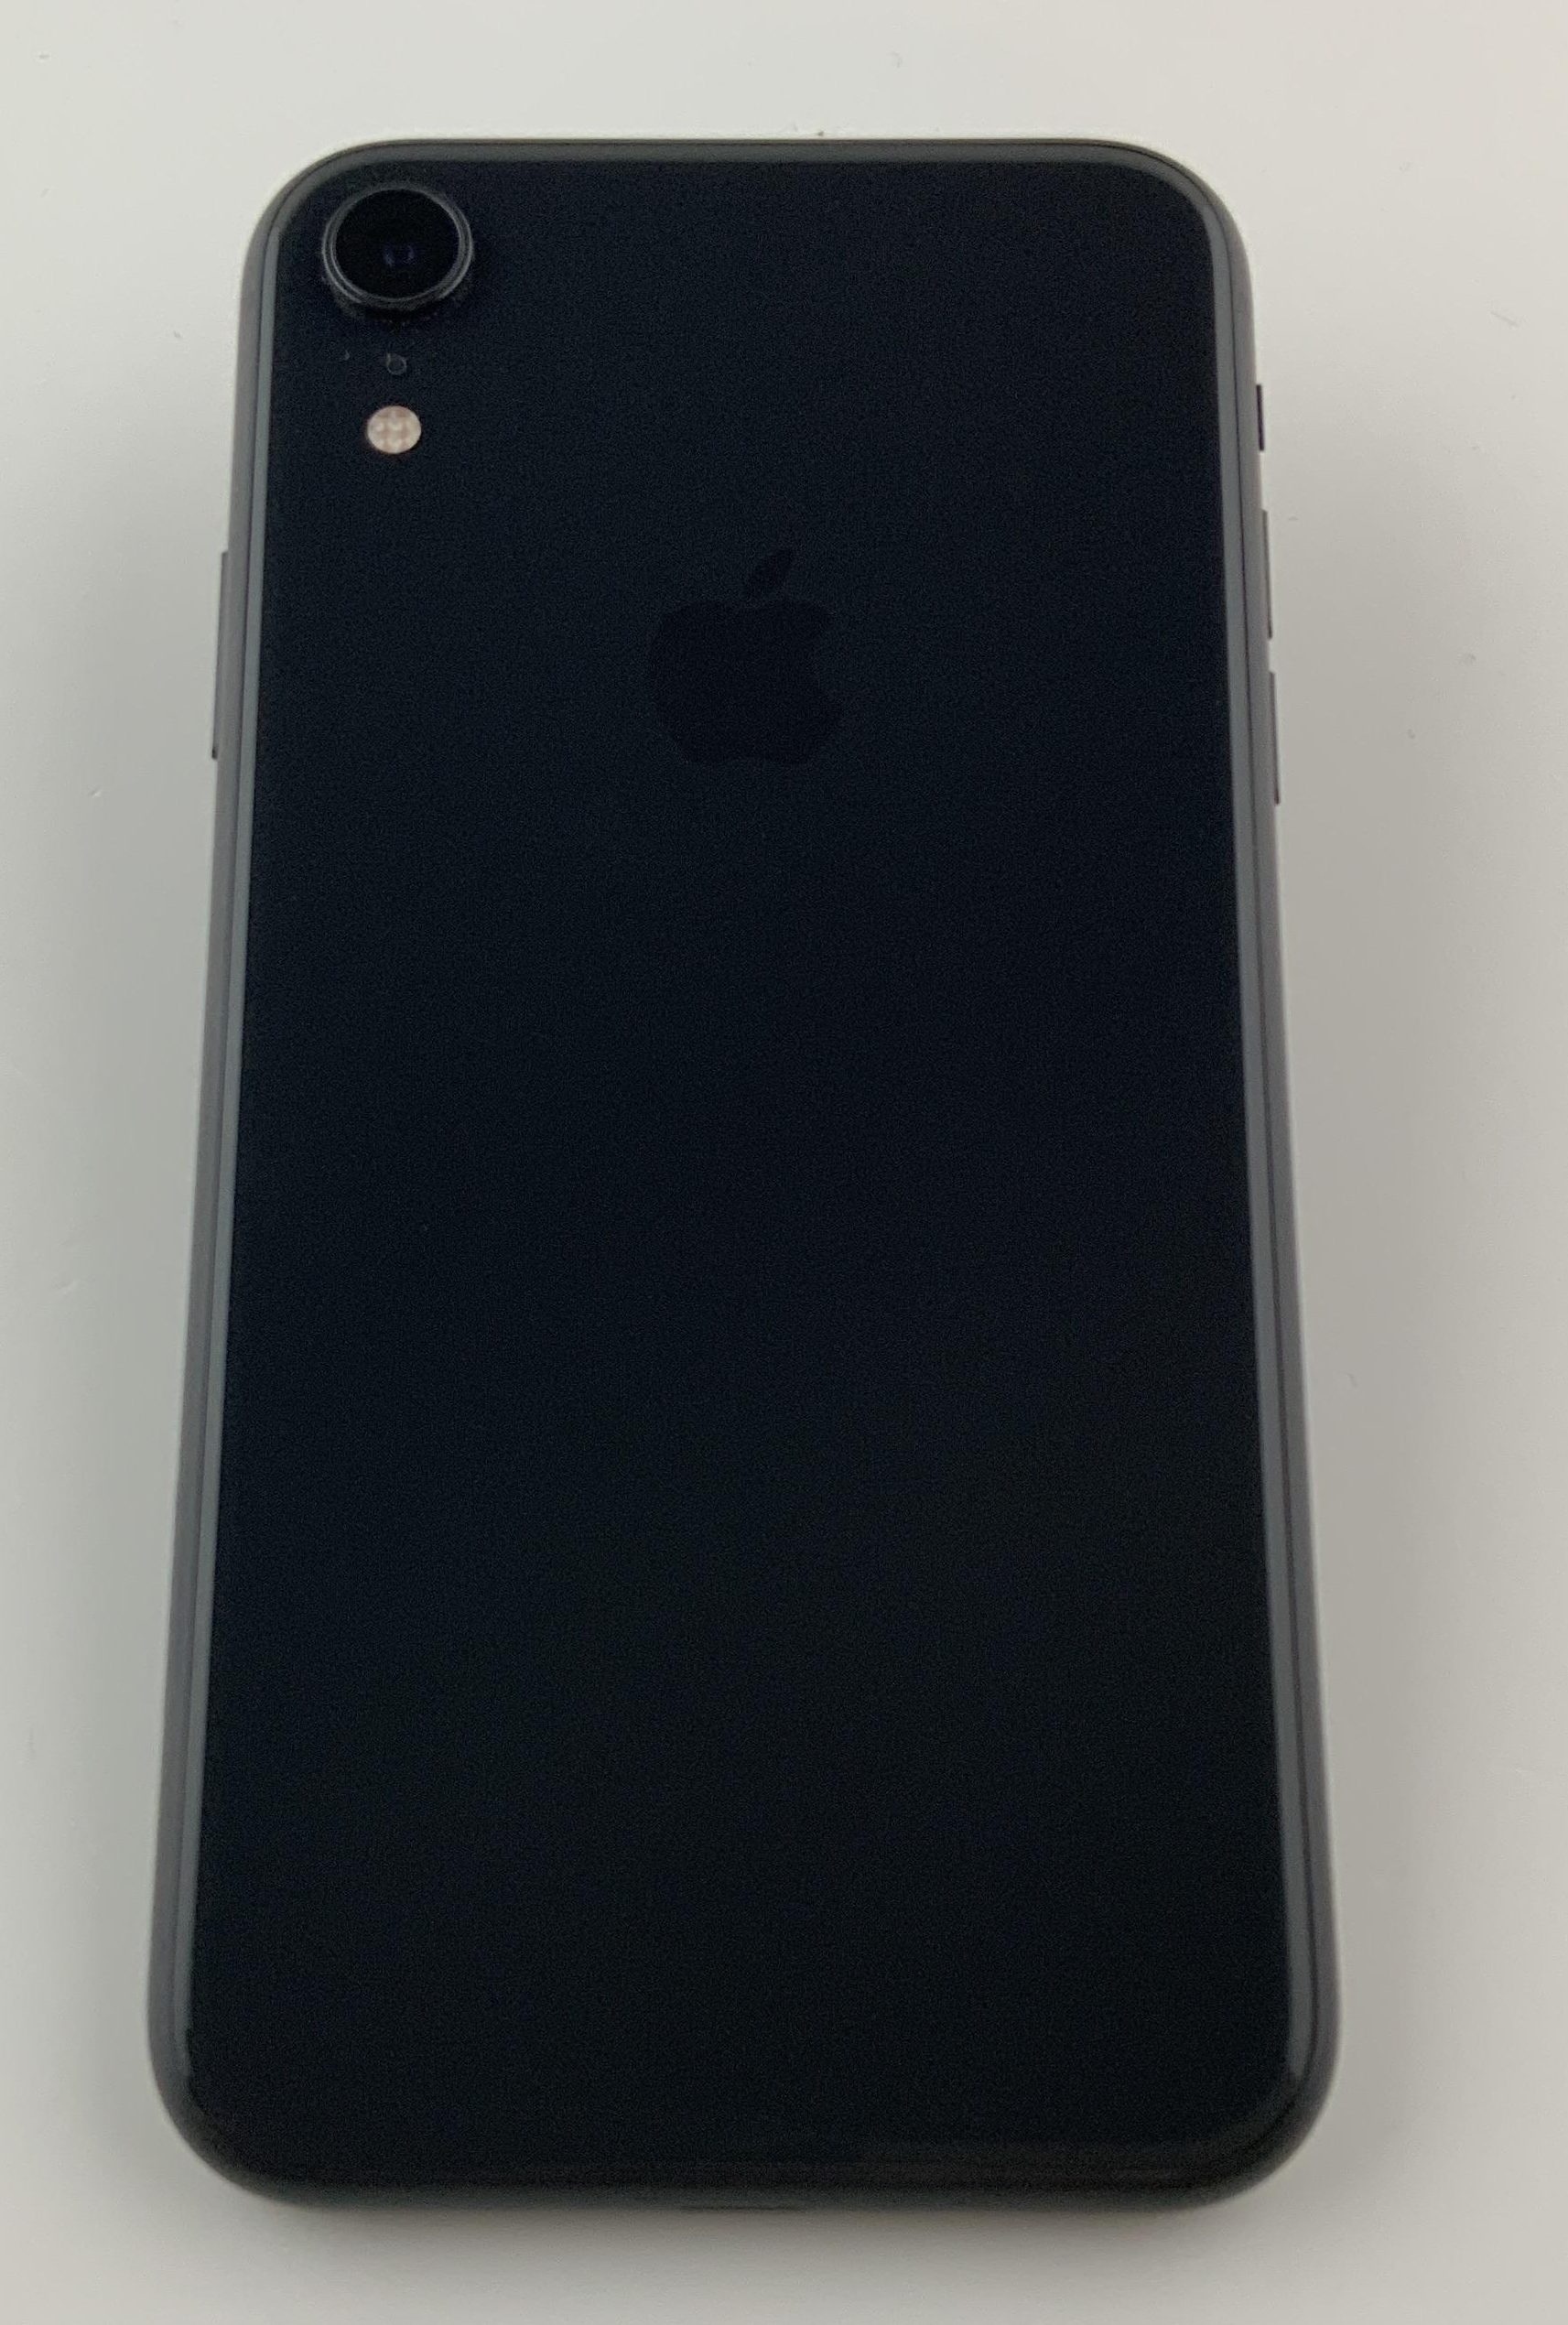 iPhone XR 64GB, 64GB, Black, Afbeelding 2